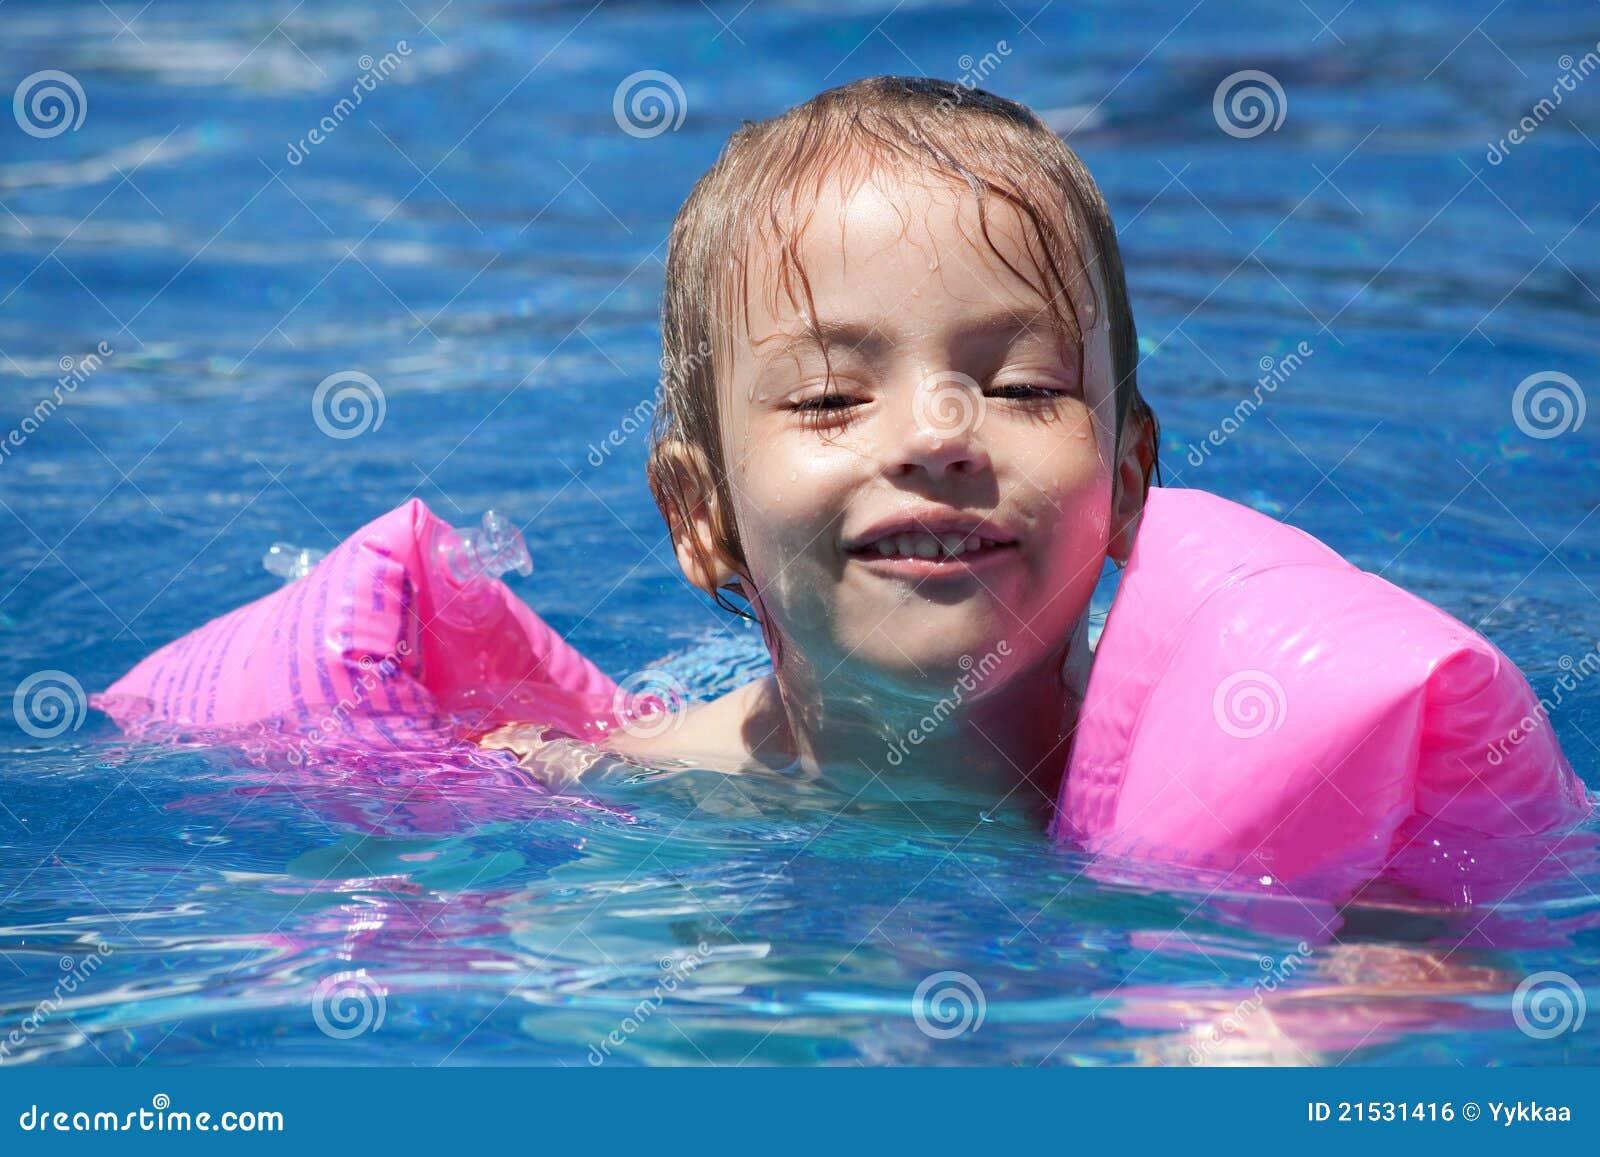 Little Girl Swimming Lake Stock Photo (Edit Now) 462478624